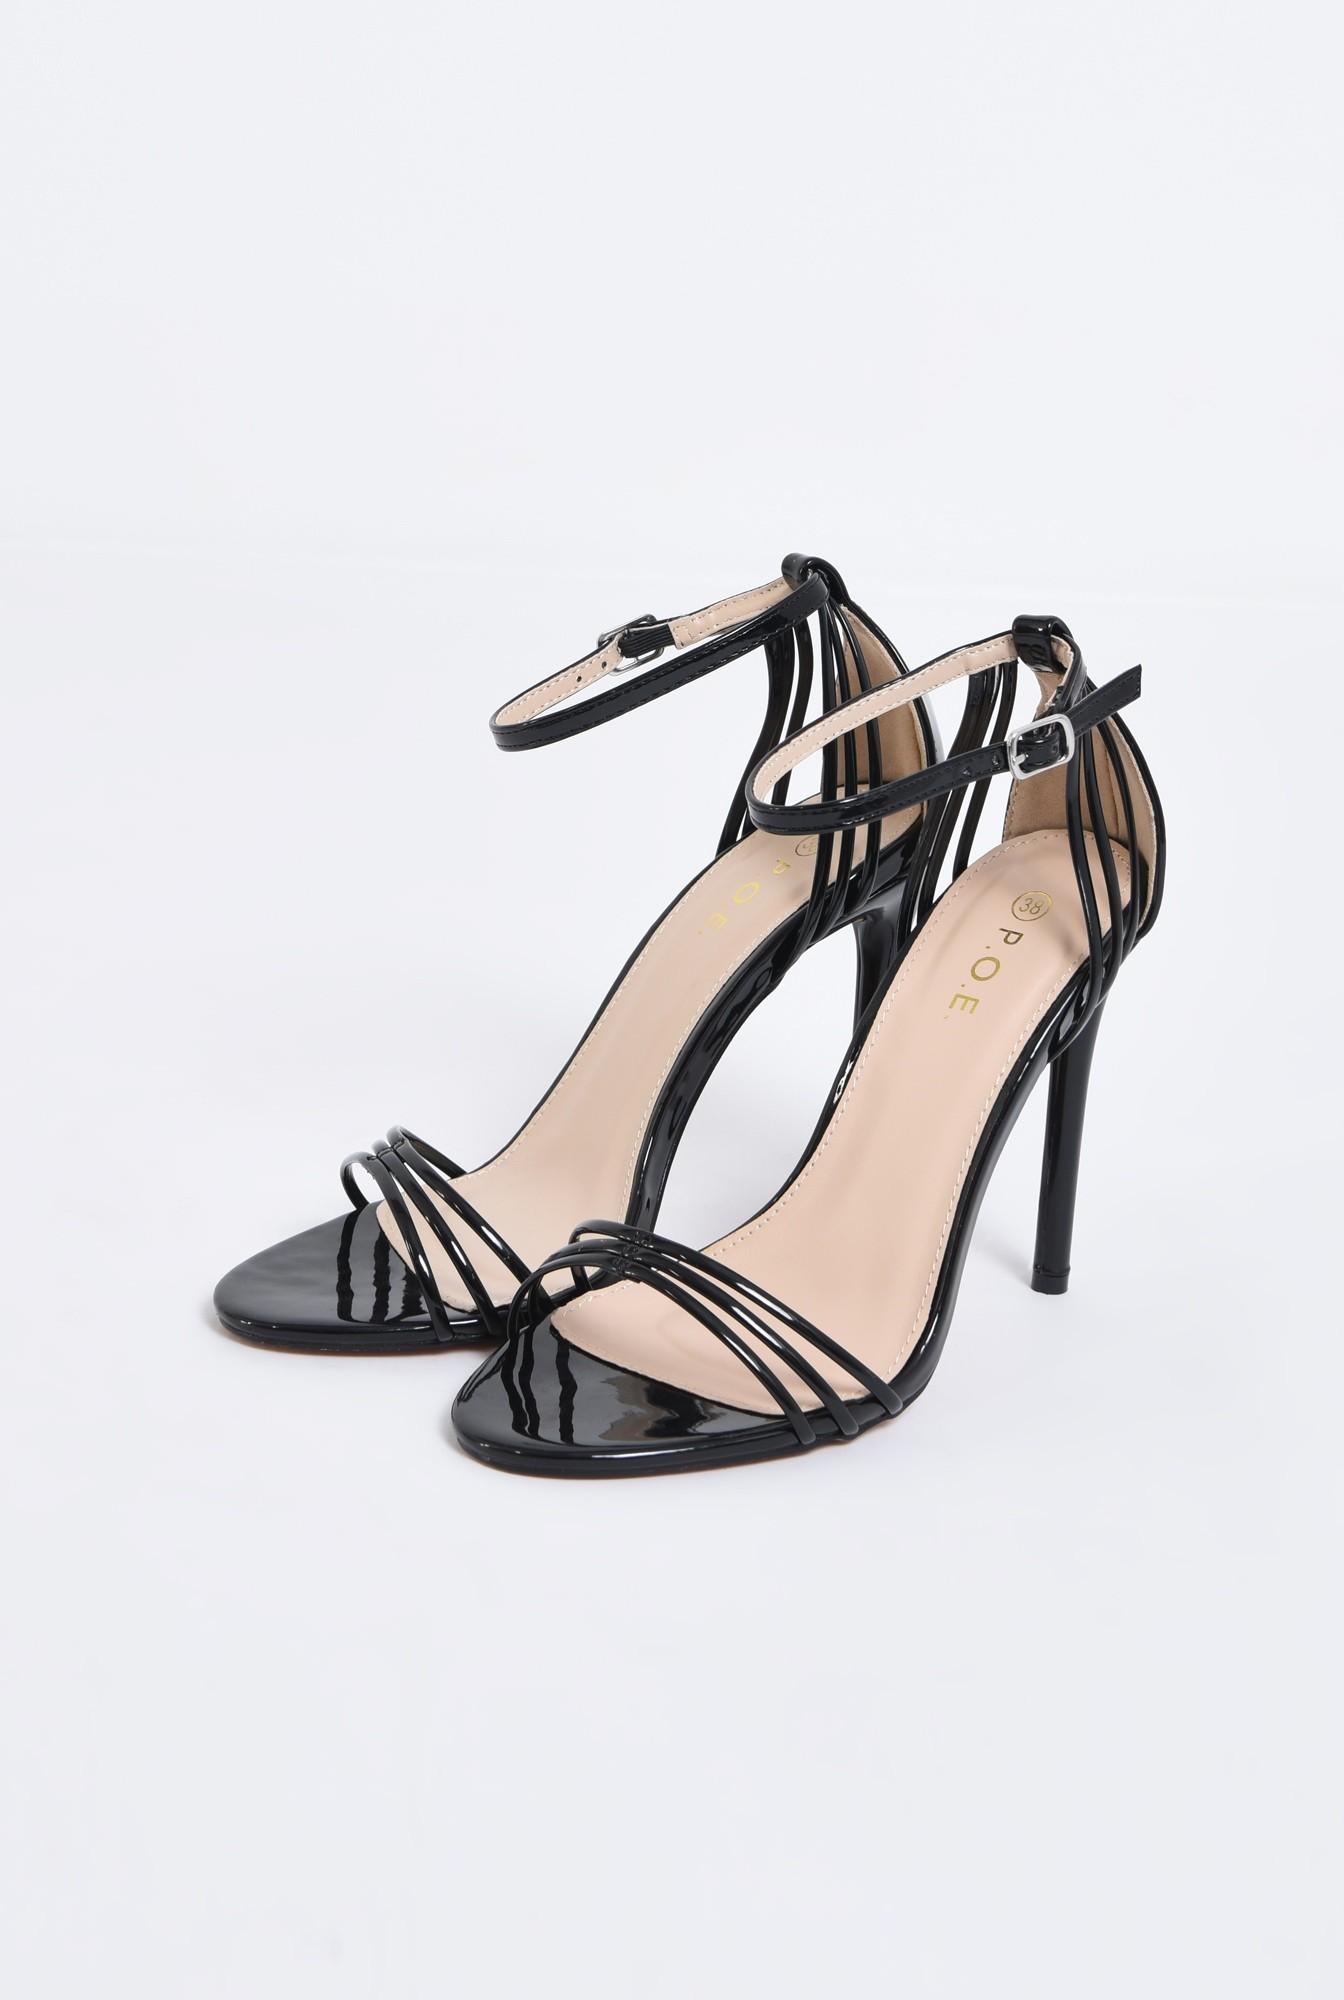 sandale elegante, din lac, negre, toc stiletto